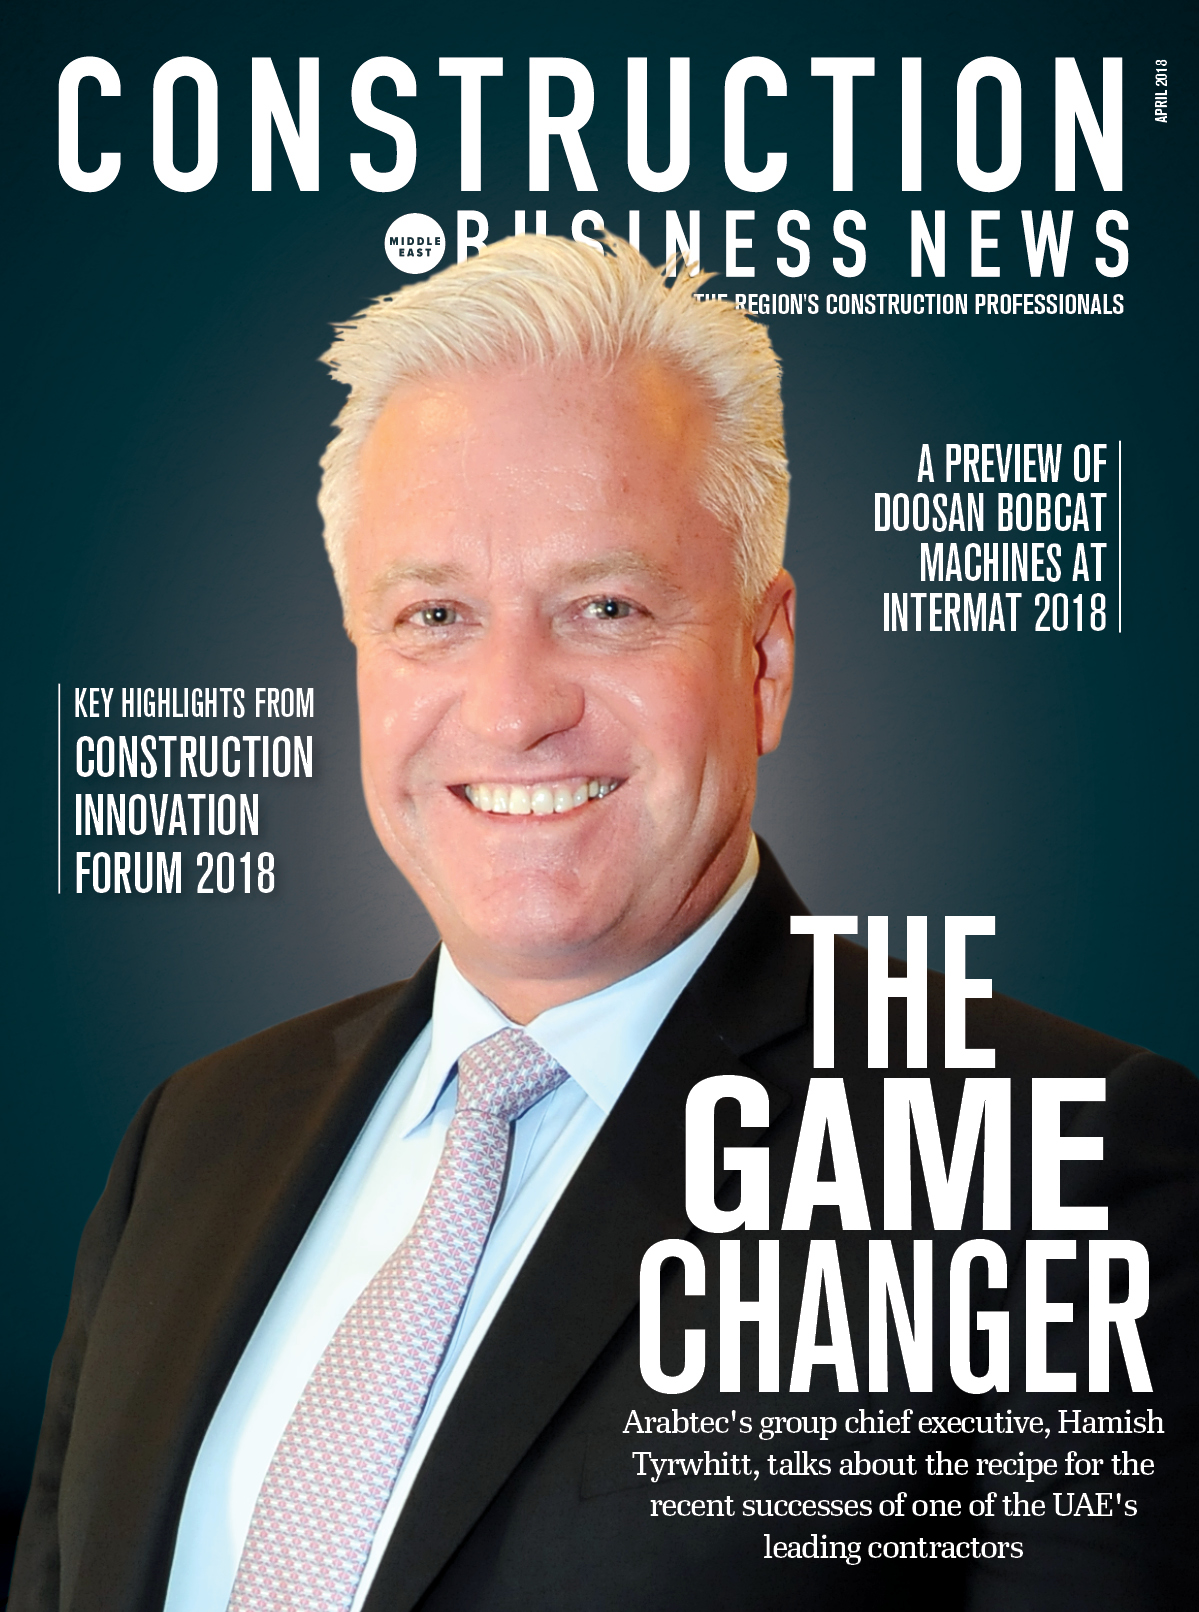 https://www.cbnme.com/magazines/construction-business-news-april-2018/